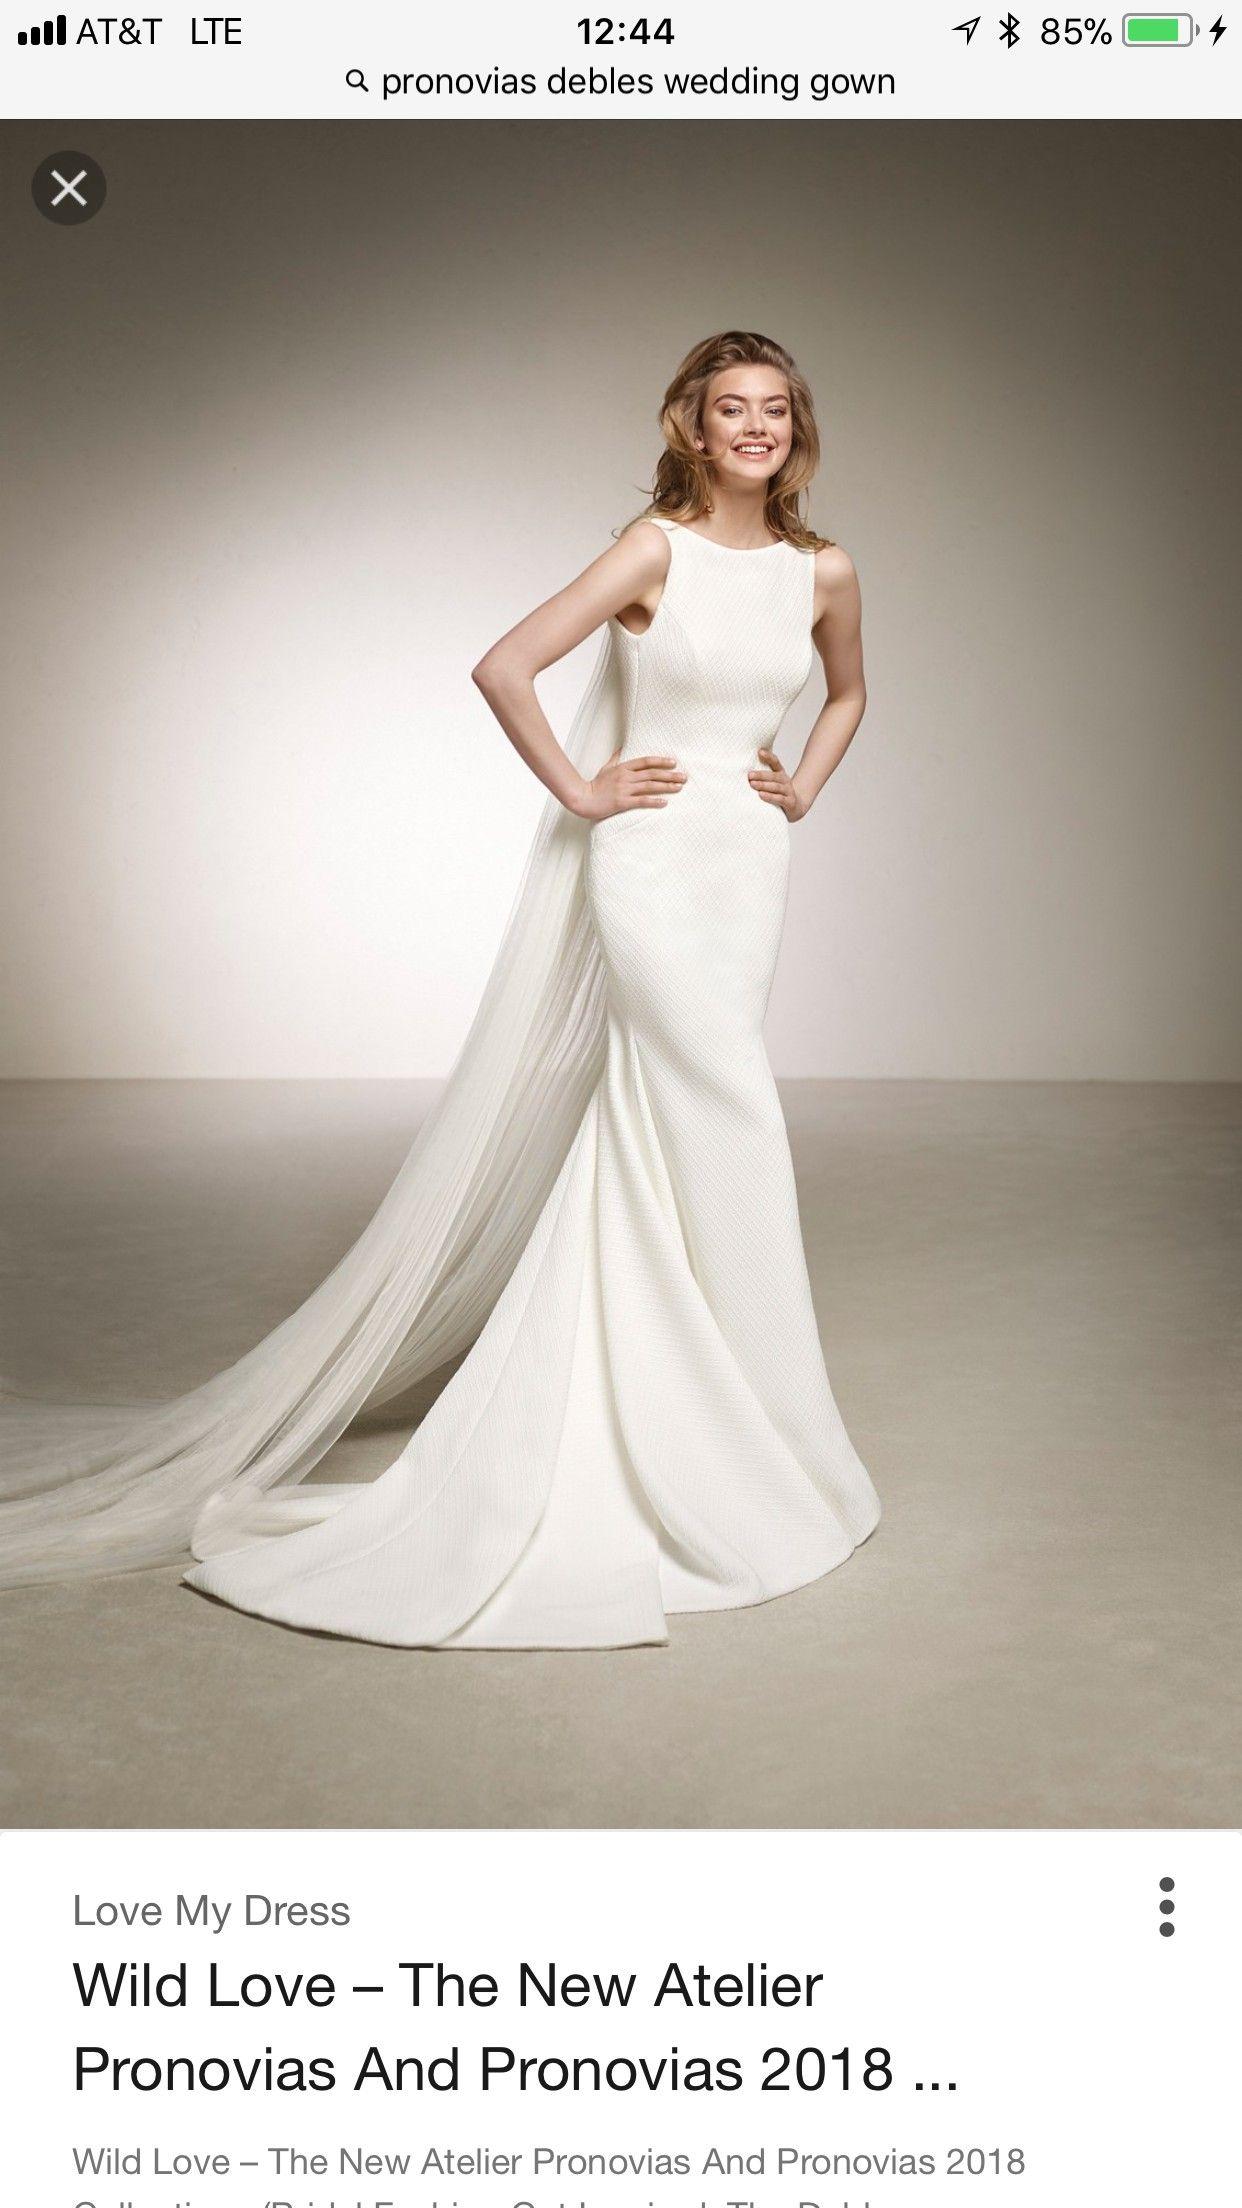 df2c5d4af85 Pronovias Debles Wedding Dress on Sale 20% Off